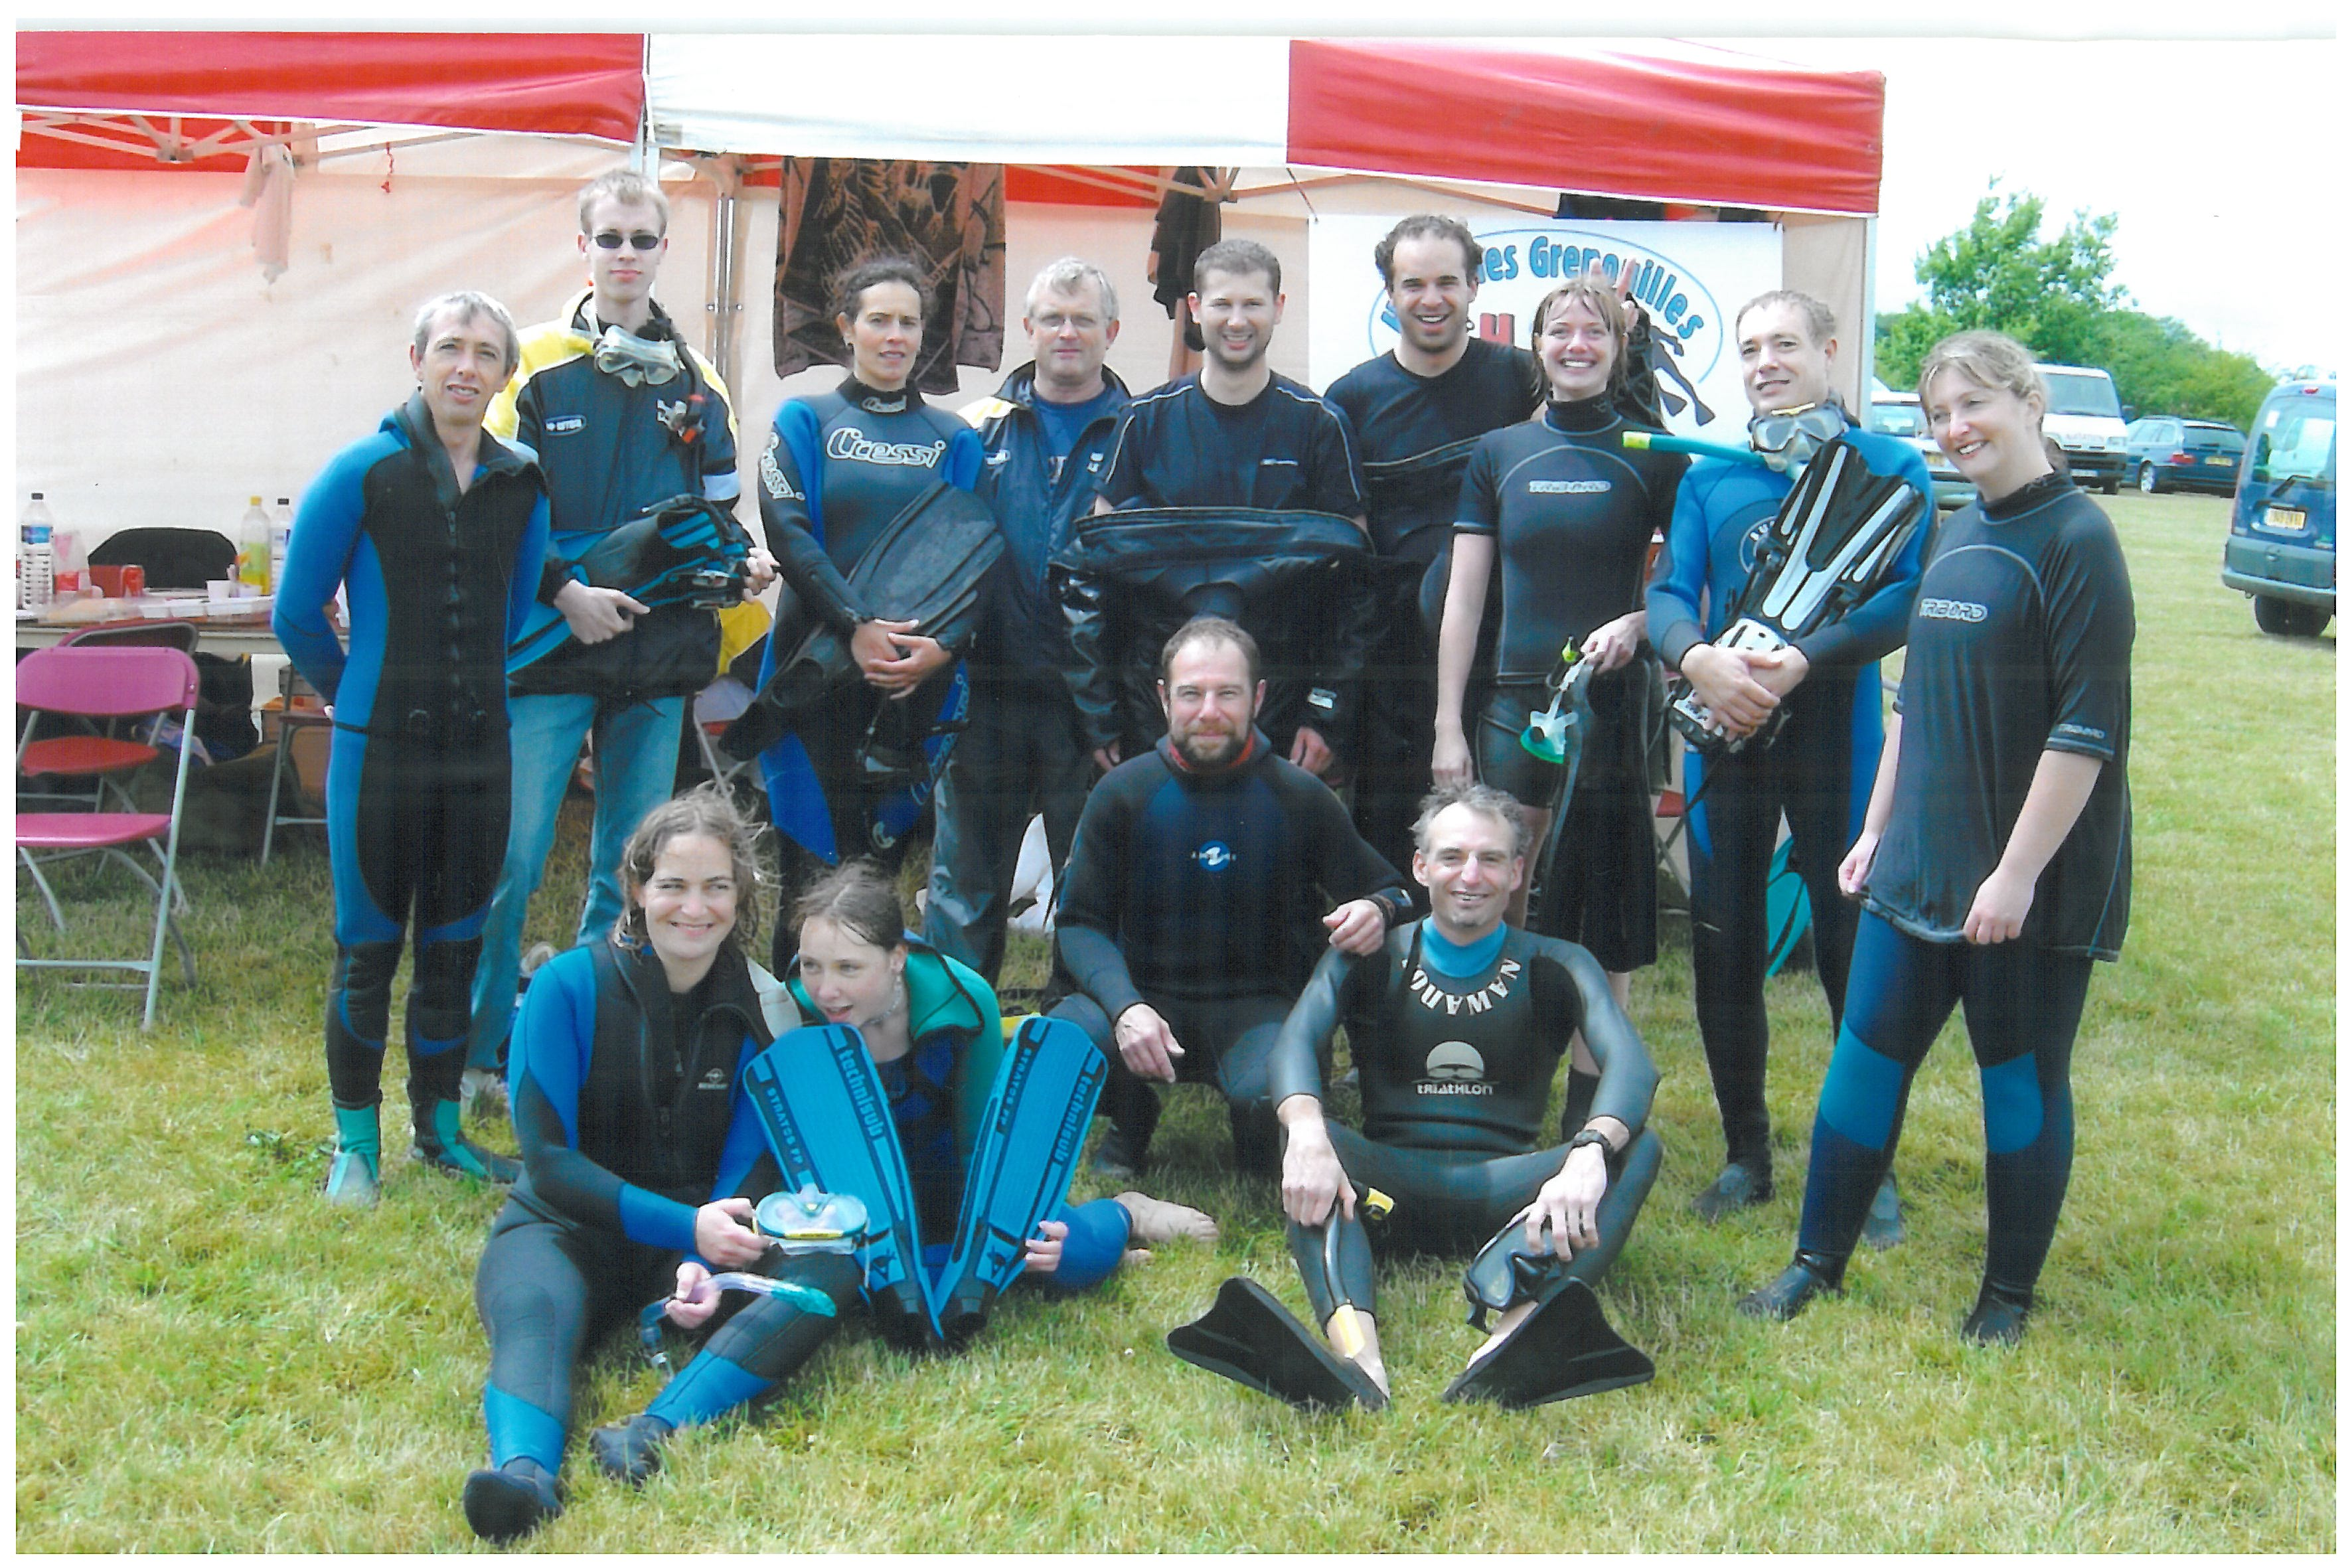 triathlon 2004 - 1